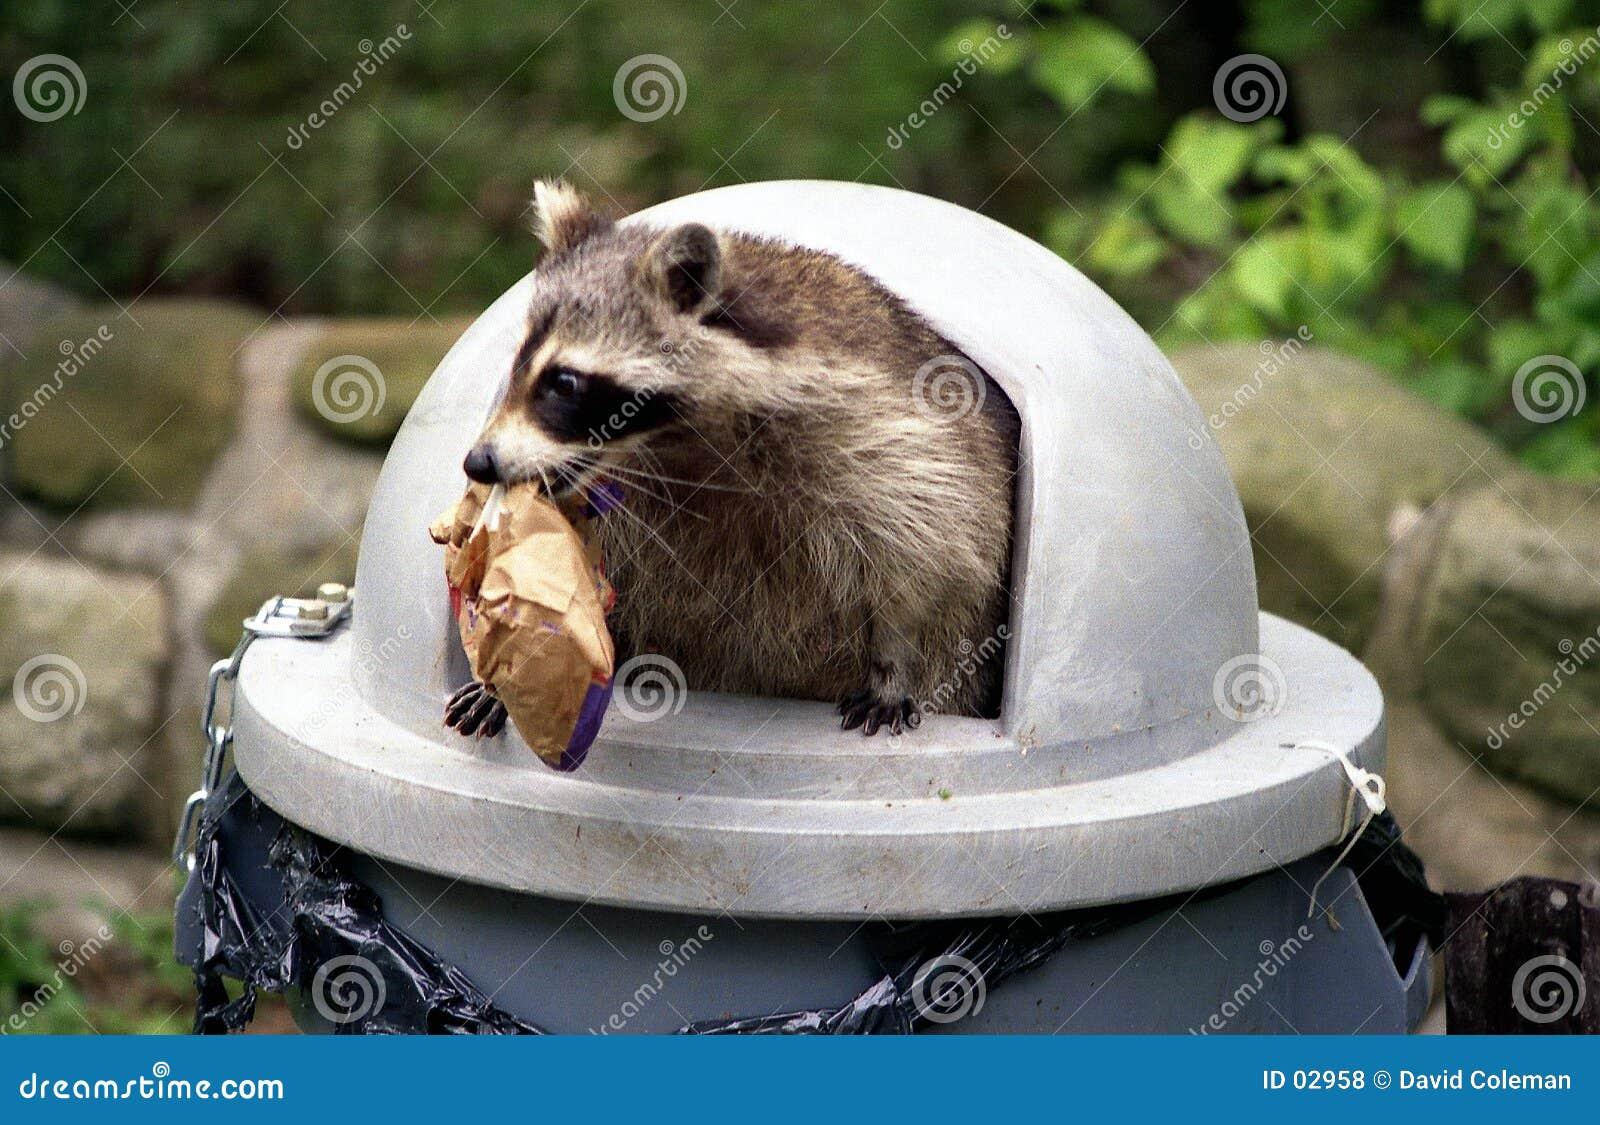 может raccoon рейдируя погань